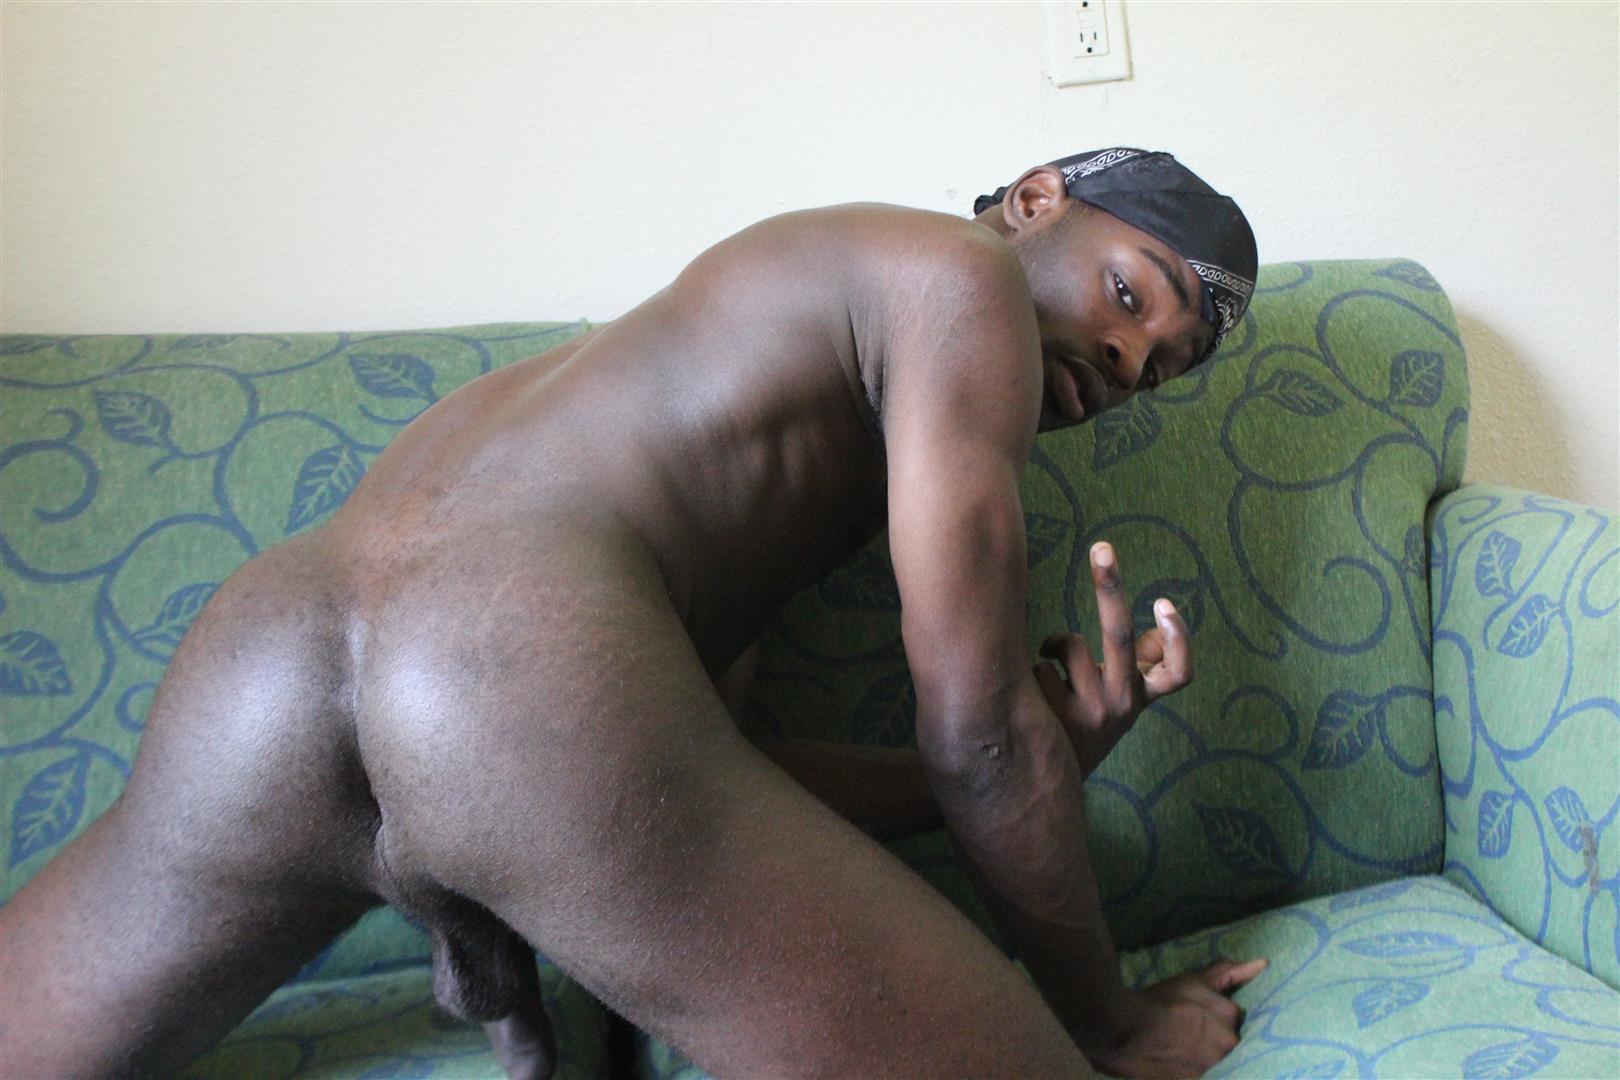 Traphouse Boys Brown and Carlos Big Black Cock Bareback Amateur Gay Porn 04 DL Thugs Barebacking With Their Big Uncut Black Dicks